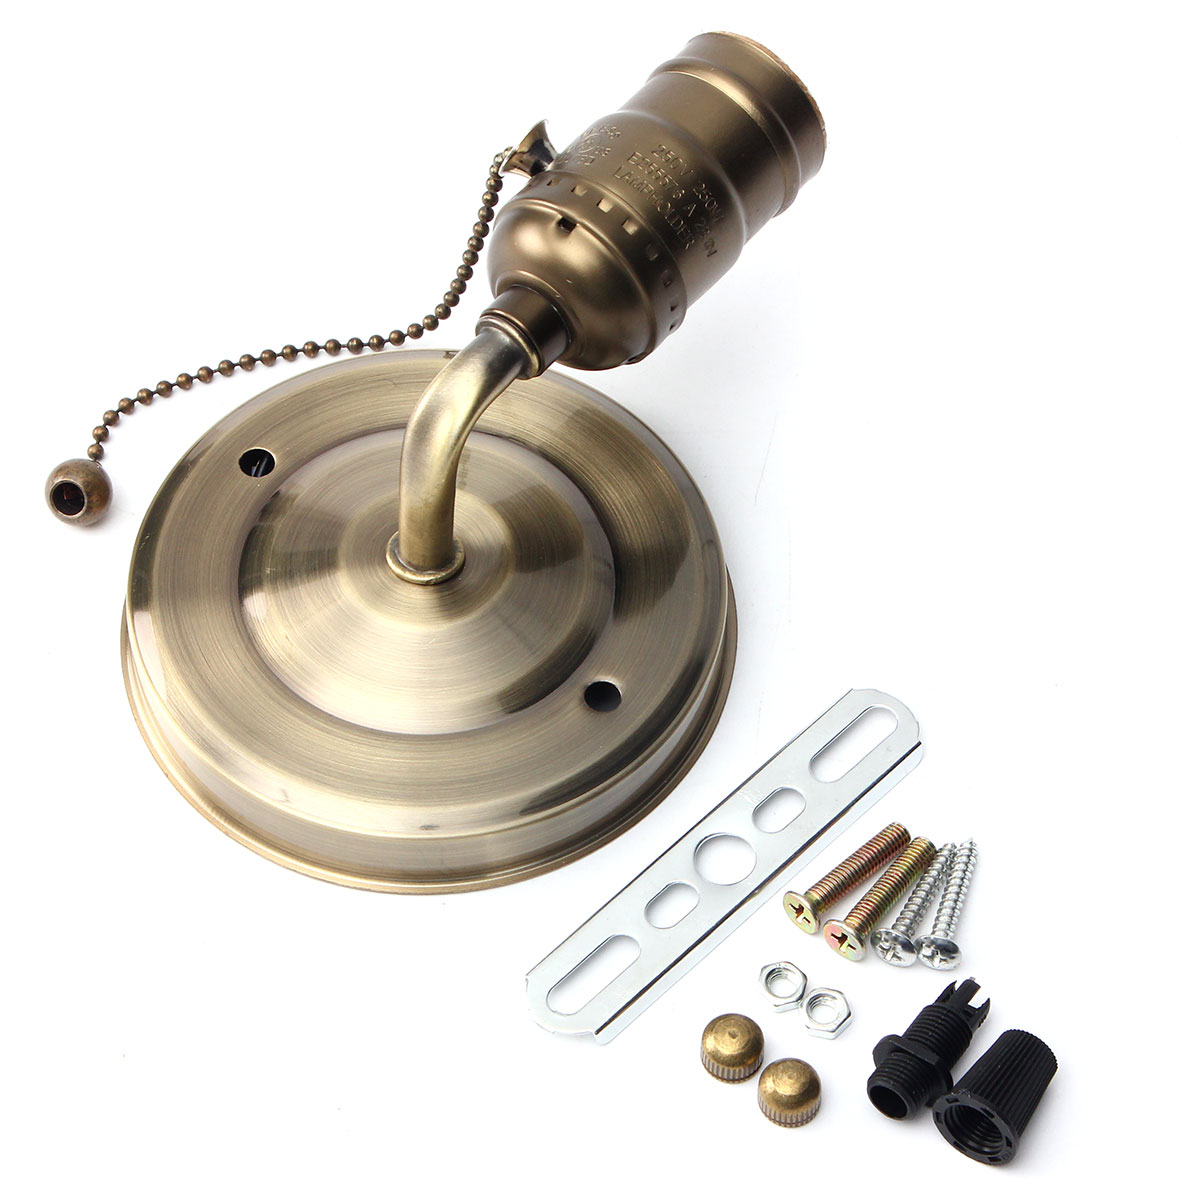 E27 Antique Vintage Wall Light Chain Design Sconce Lamp Bulb ... for Bulb Holder Design  585hul